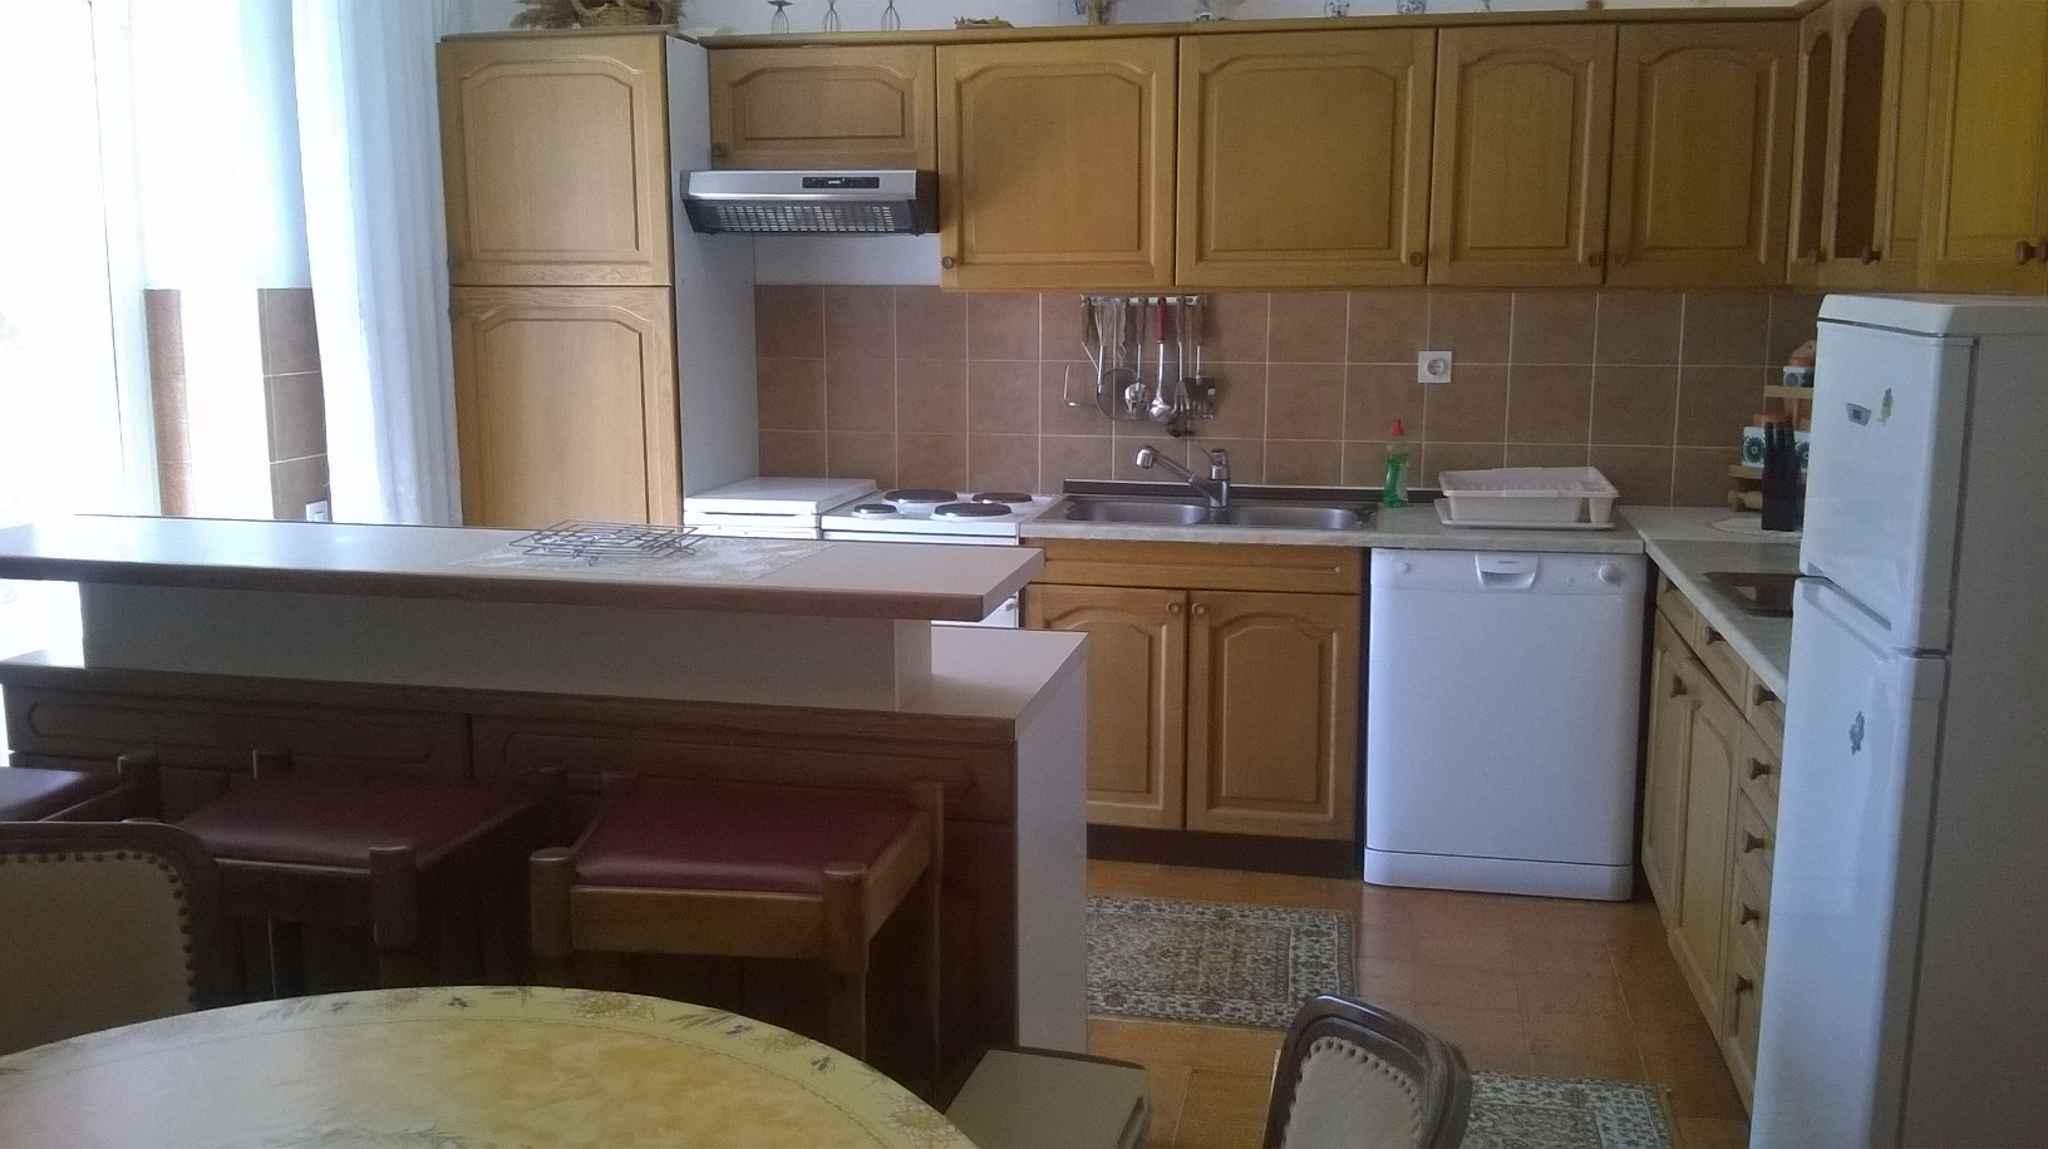 Appartement de vacances s ljetnom kuhinjom i bazenom (648047), Grižane, , Kvarner, Croatie, image 15